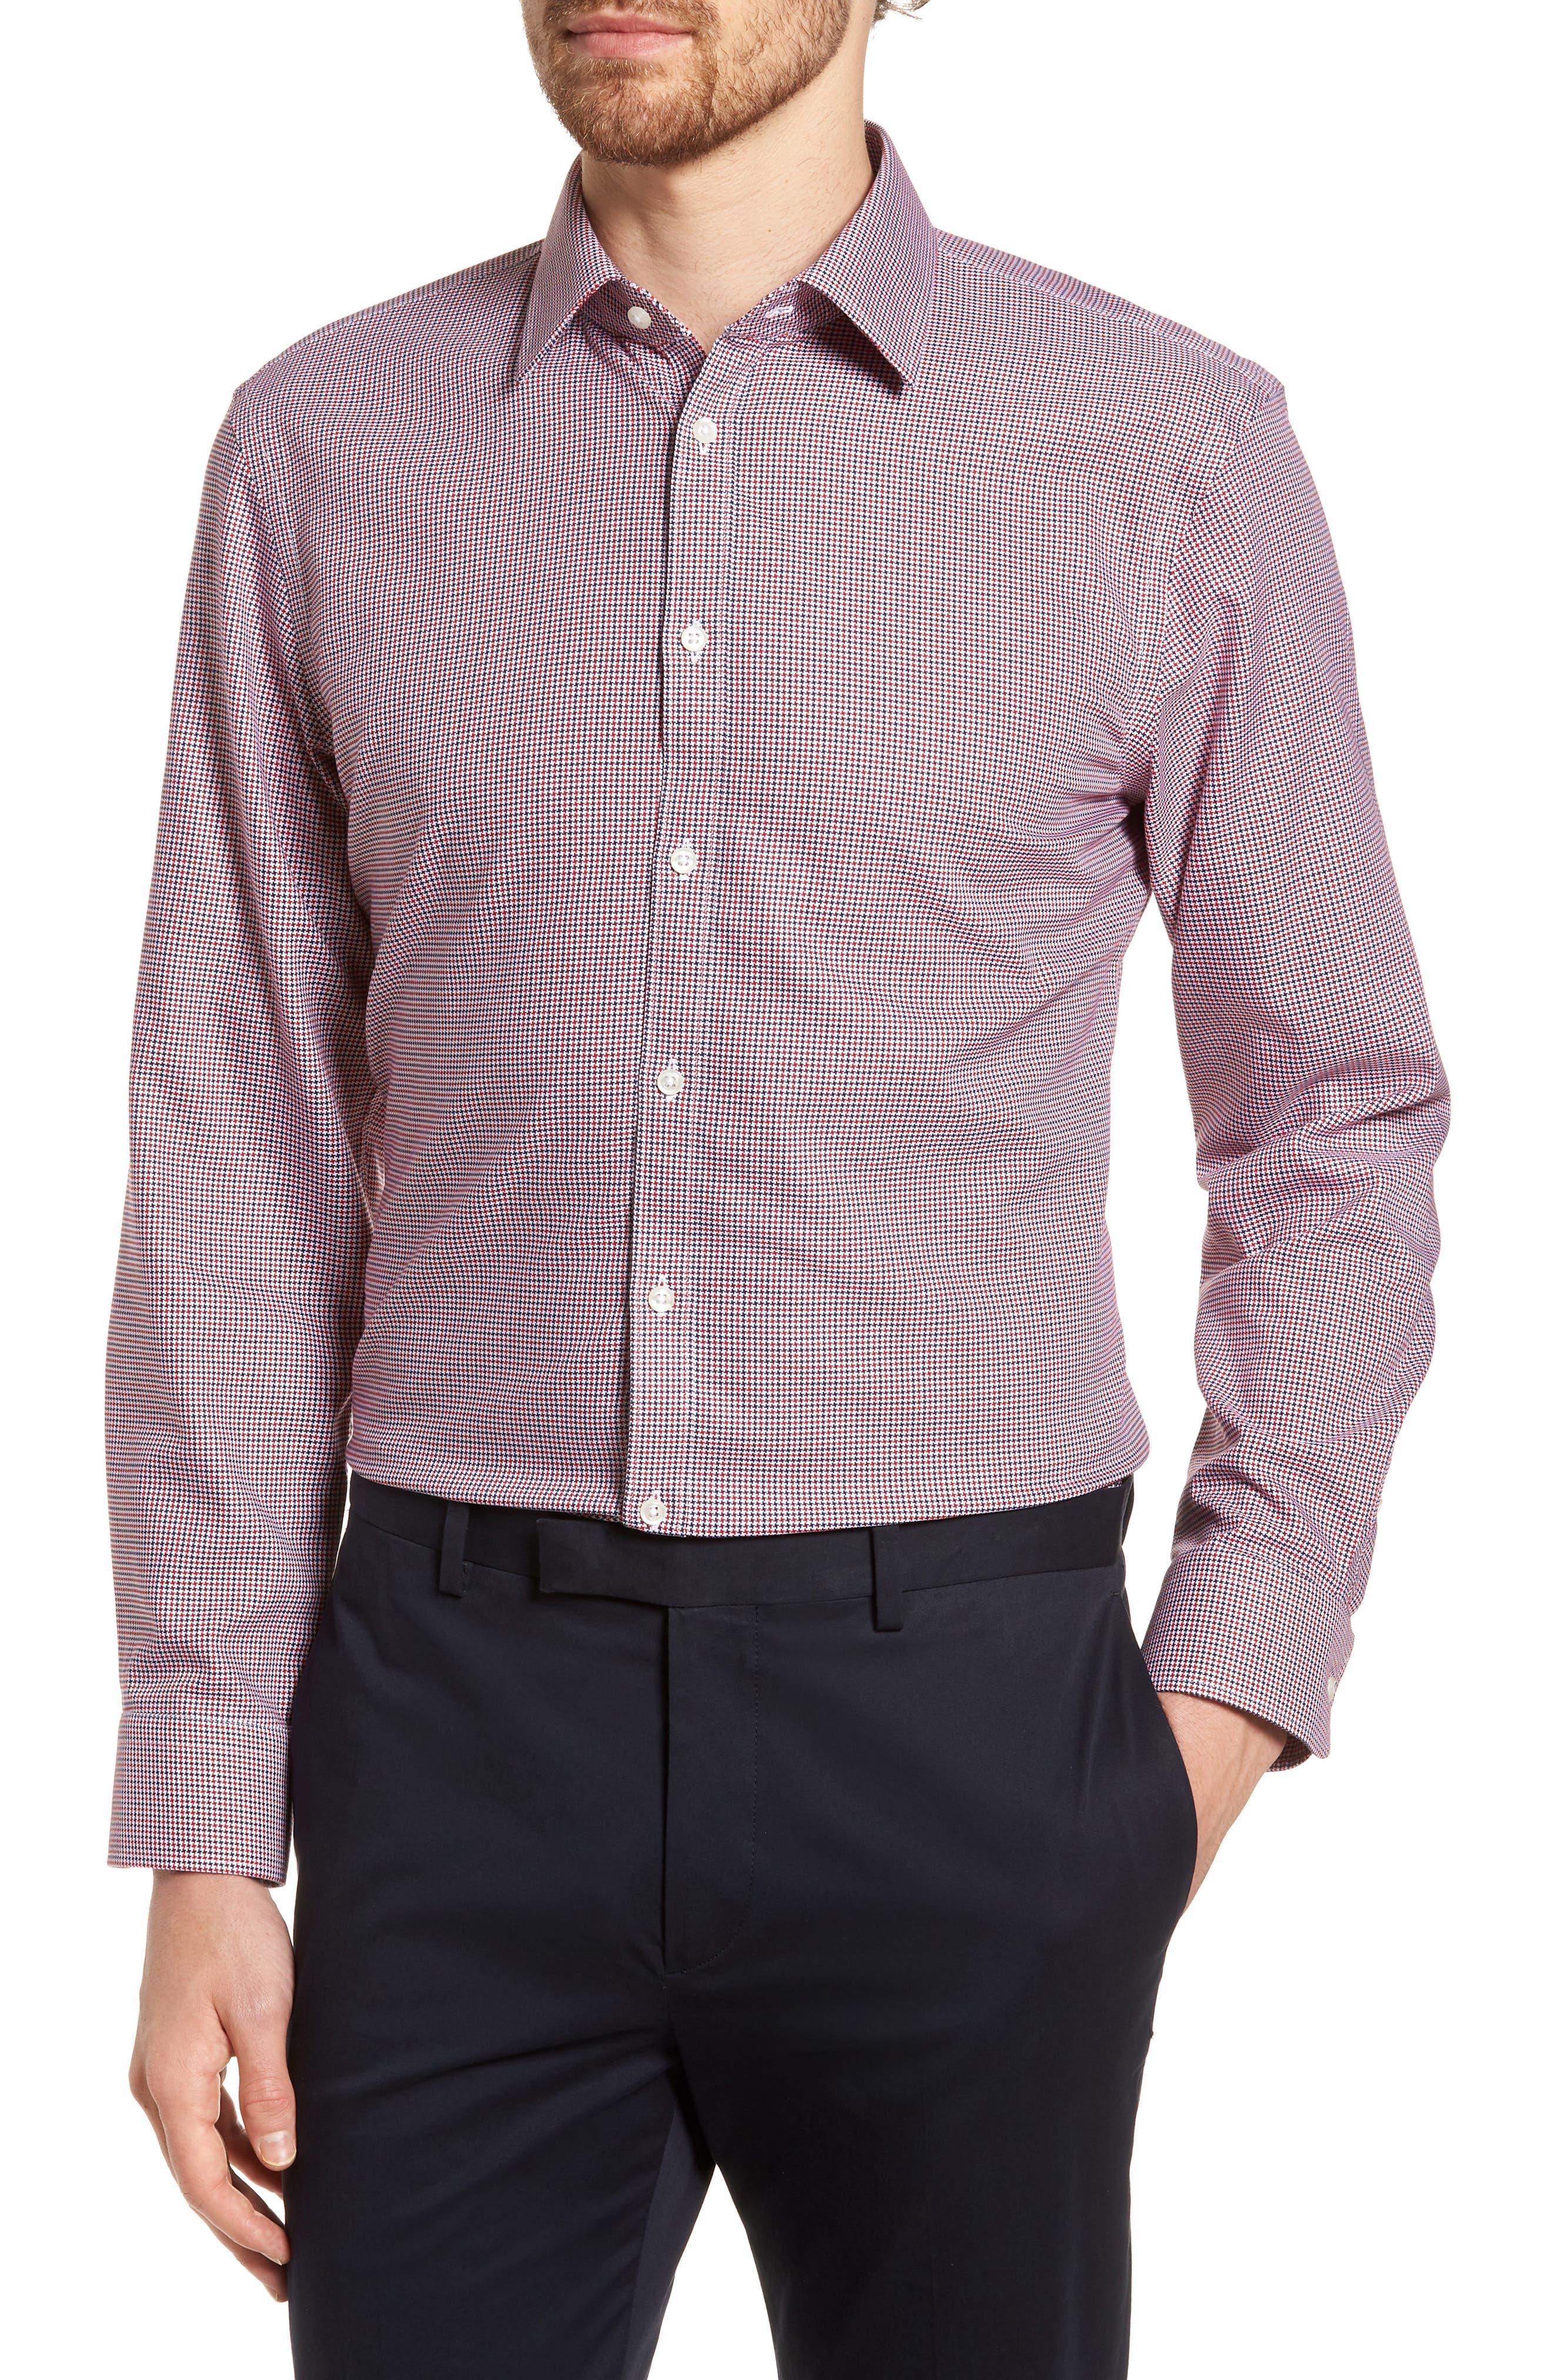 Main Image - Nordstrom Men's Shop Smartcare™ Extra Trim Fit Houndstooth Dress Shirt